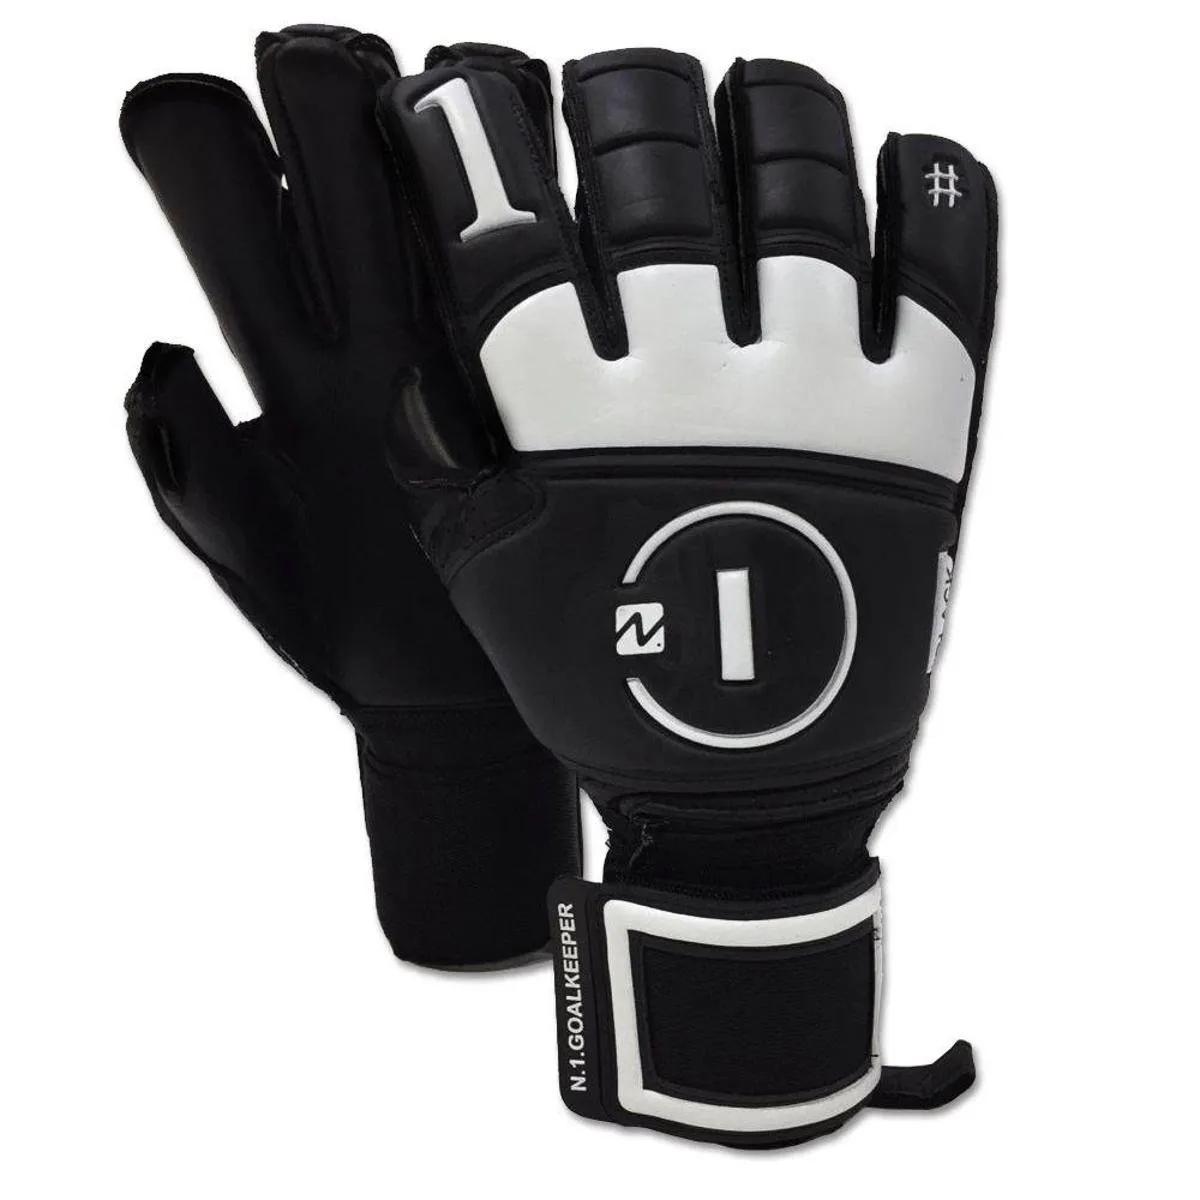 Luva N1 Goalkeeper Beta Elite Black